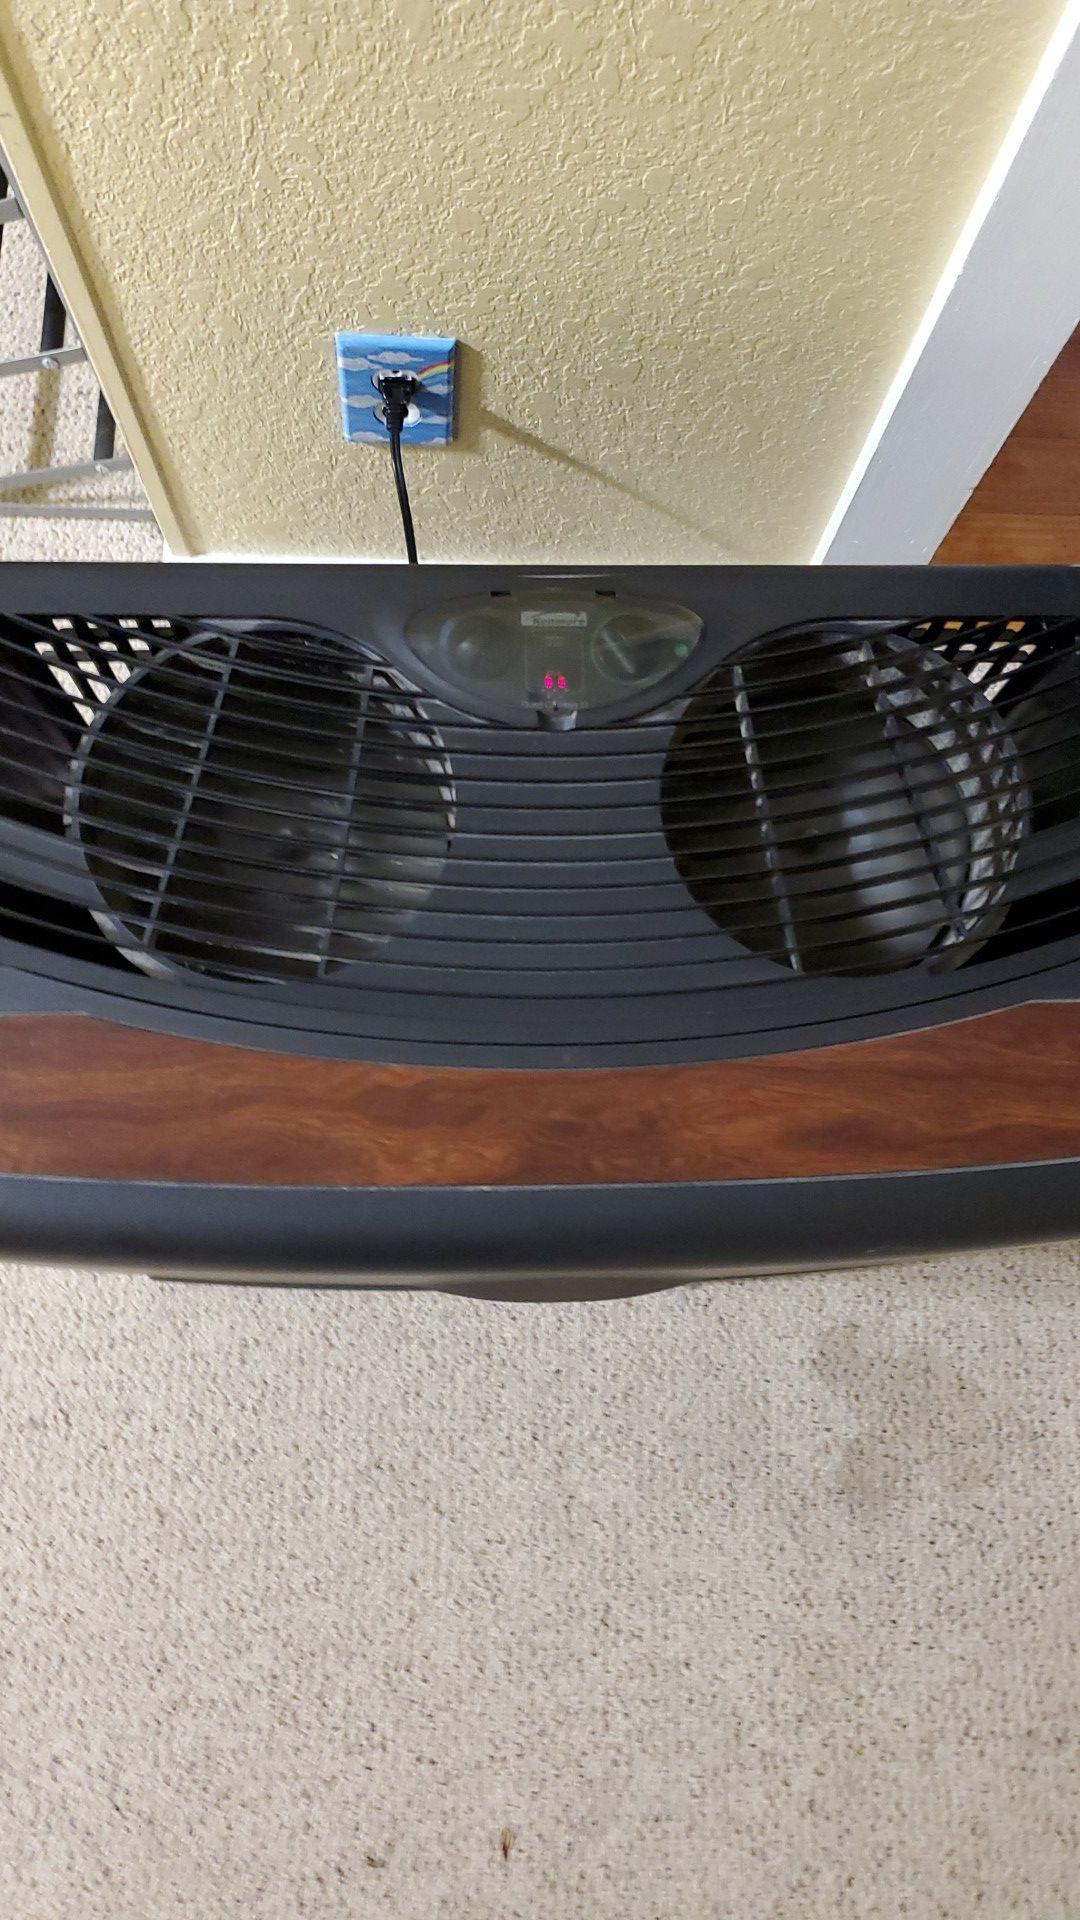 Kenmore humidifier